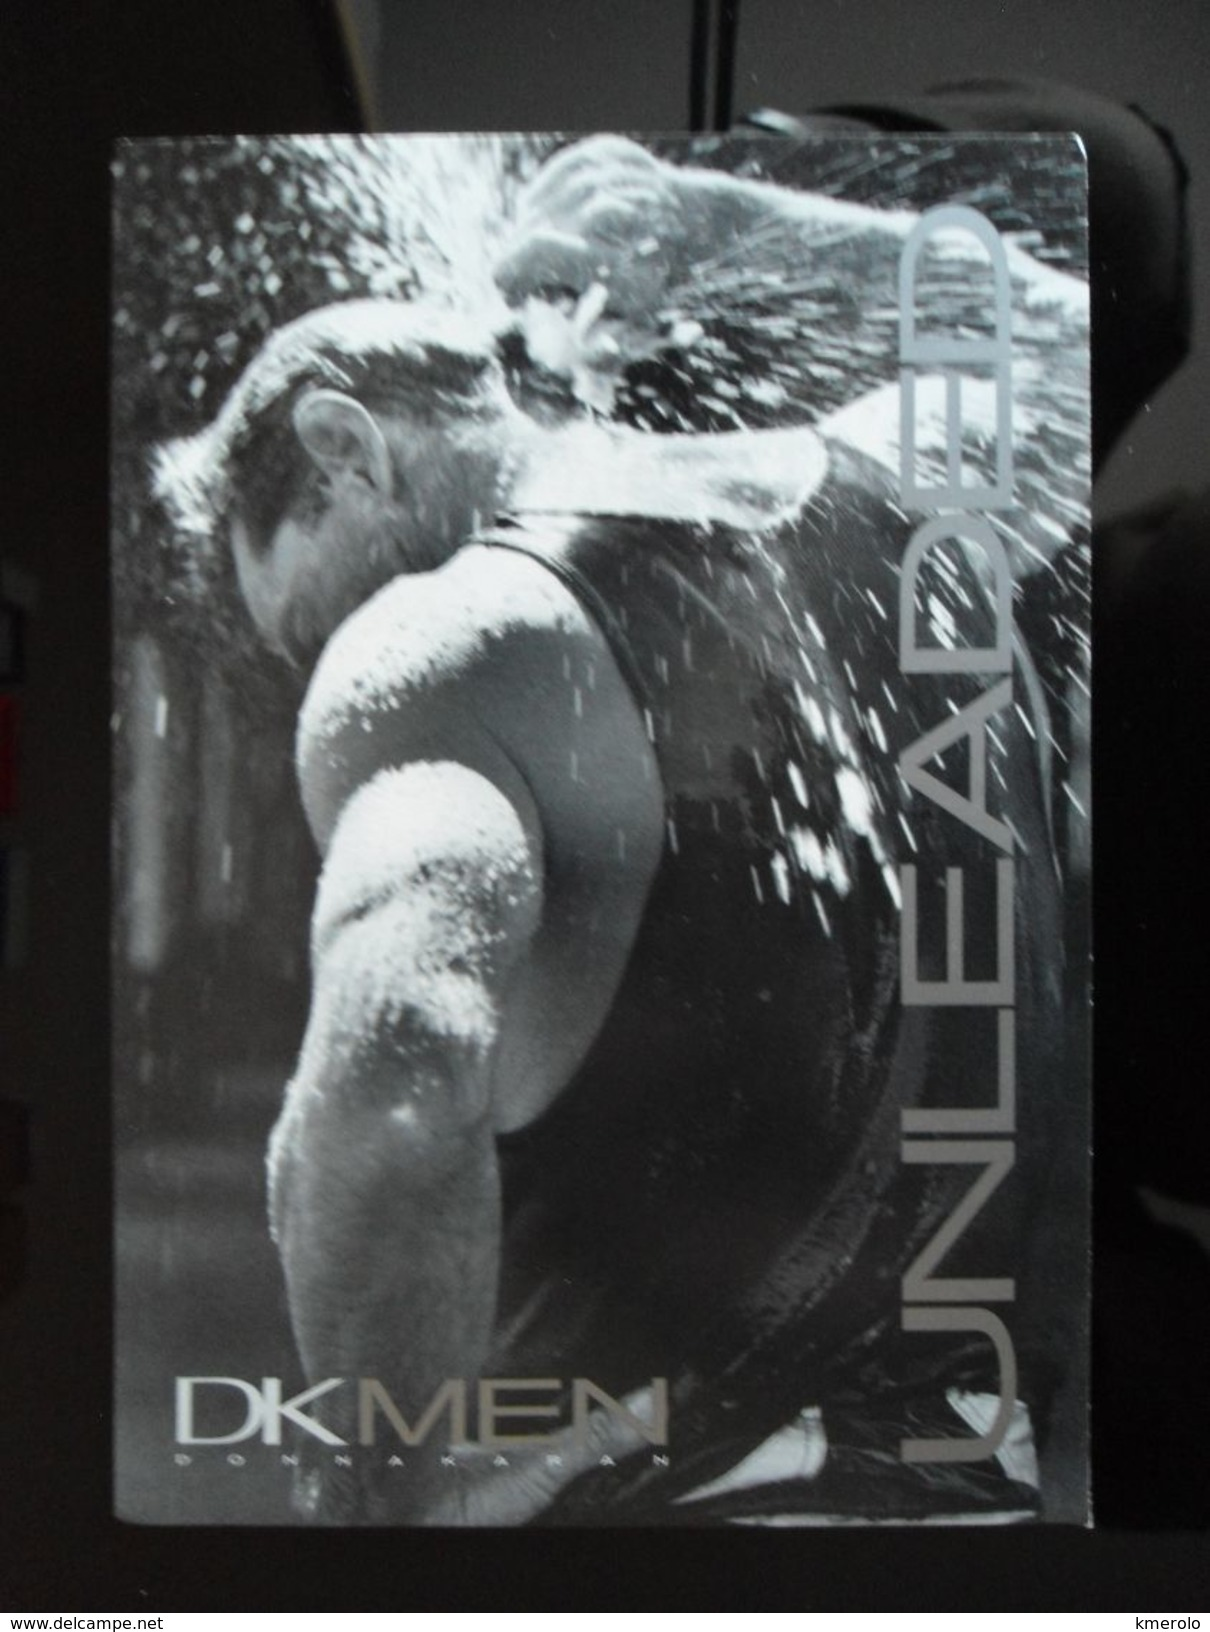 DKMEN Parfum Carte Postale - Modern (from 1961)